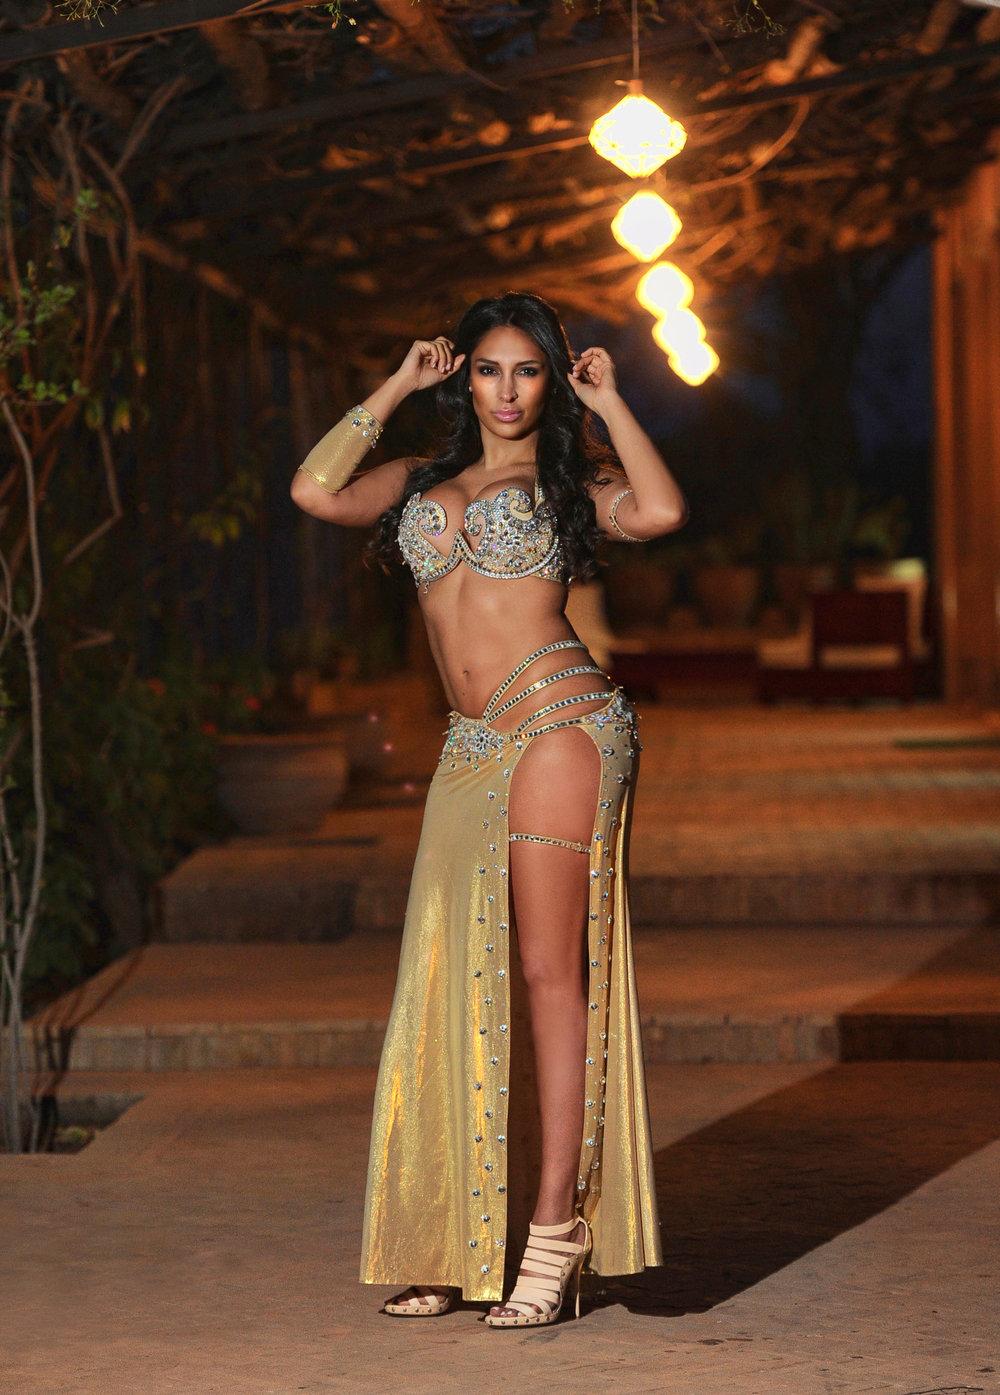 Pegah Belly Dancer Gold 5.jpg